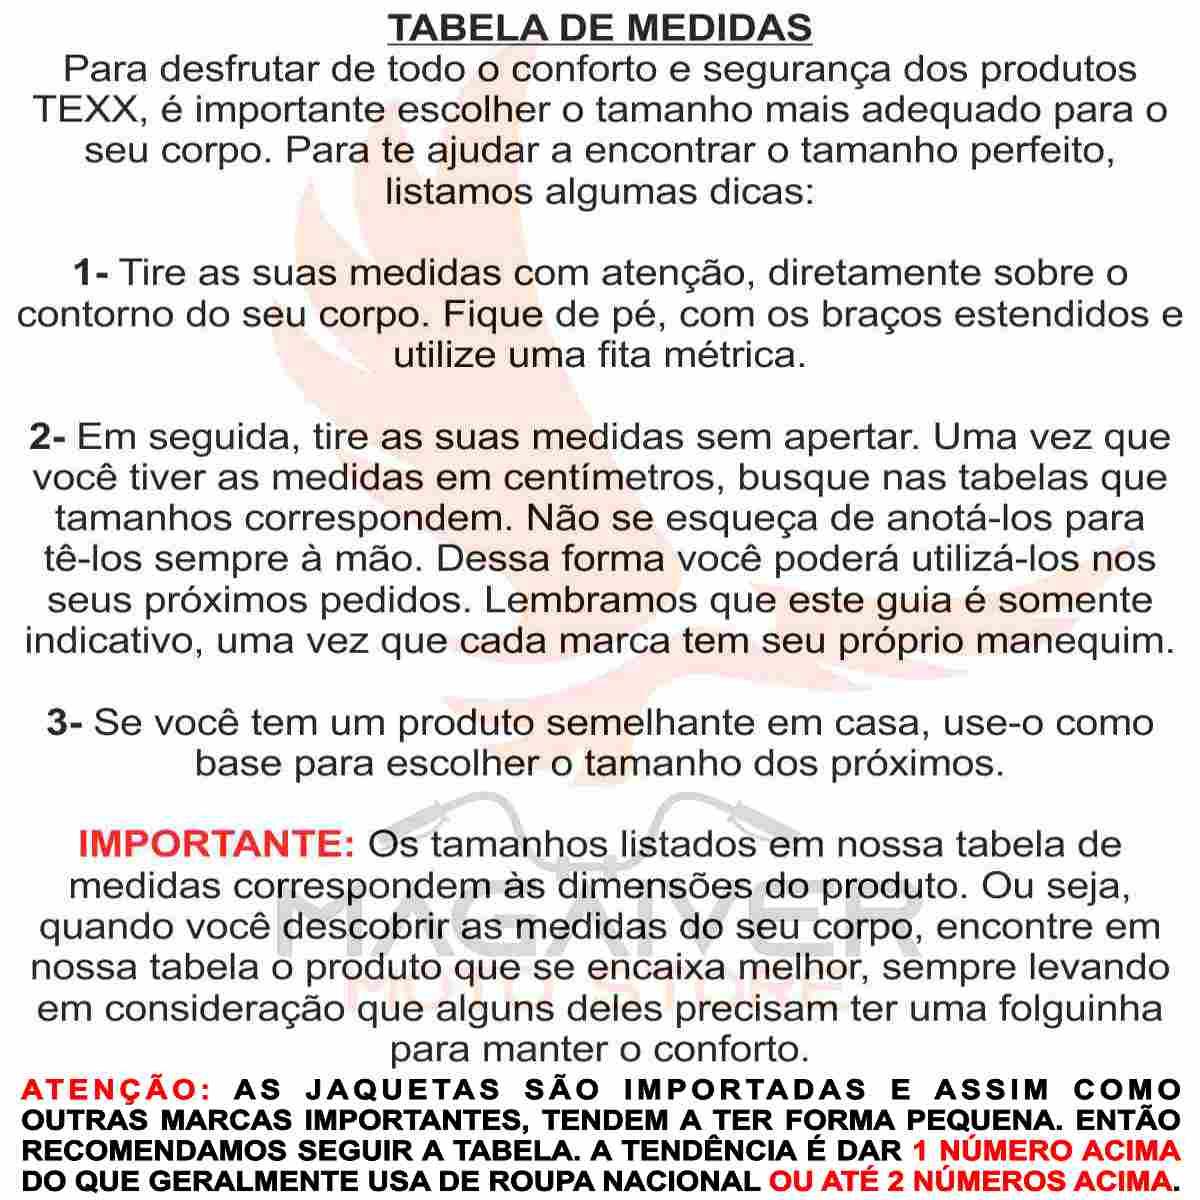 JAQUETA MOTOCICLISTA TEXX STRIKE SUMMER ( VERÃO ) II MASCULINO (OT-01)